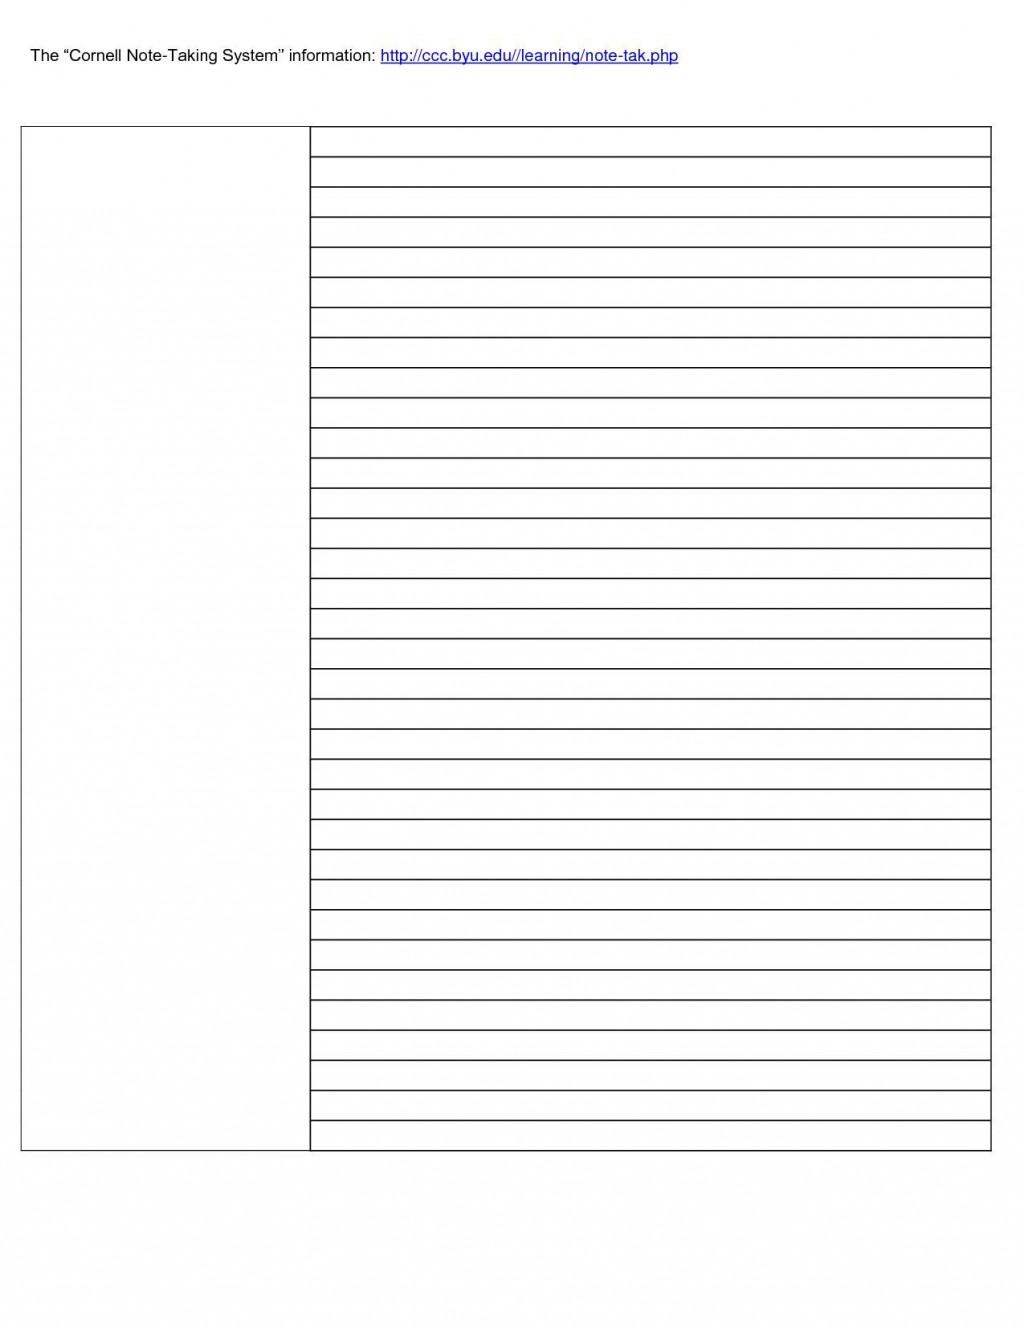 002 Formidable Note Taking Template Word Idea  Microsoft Cornell Doc MethodLarge